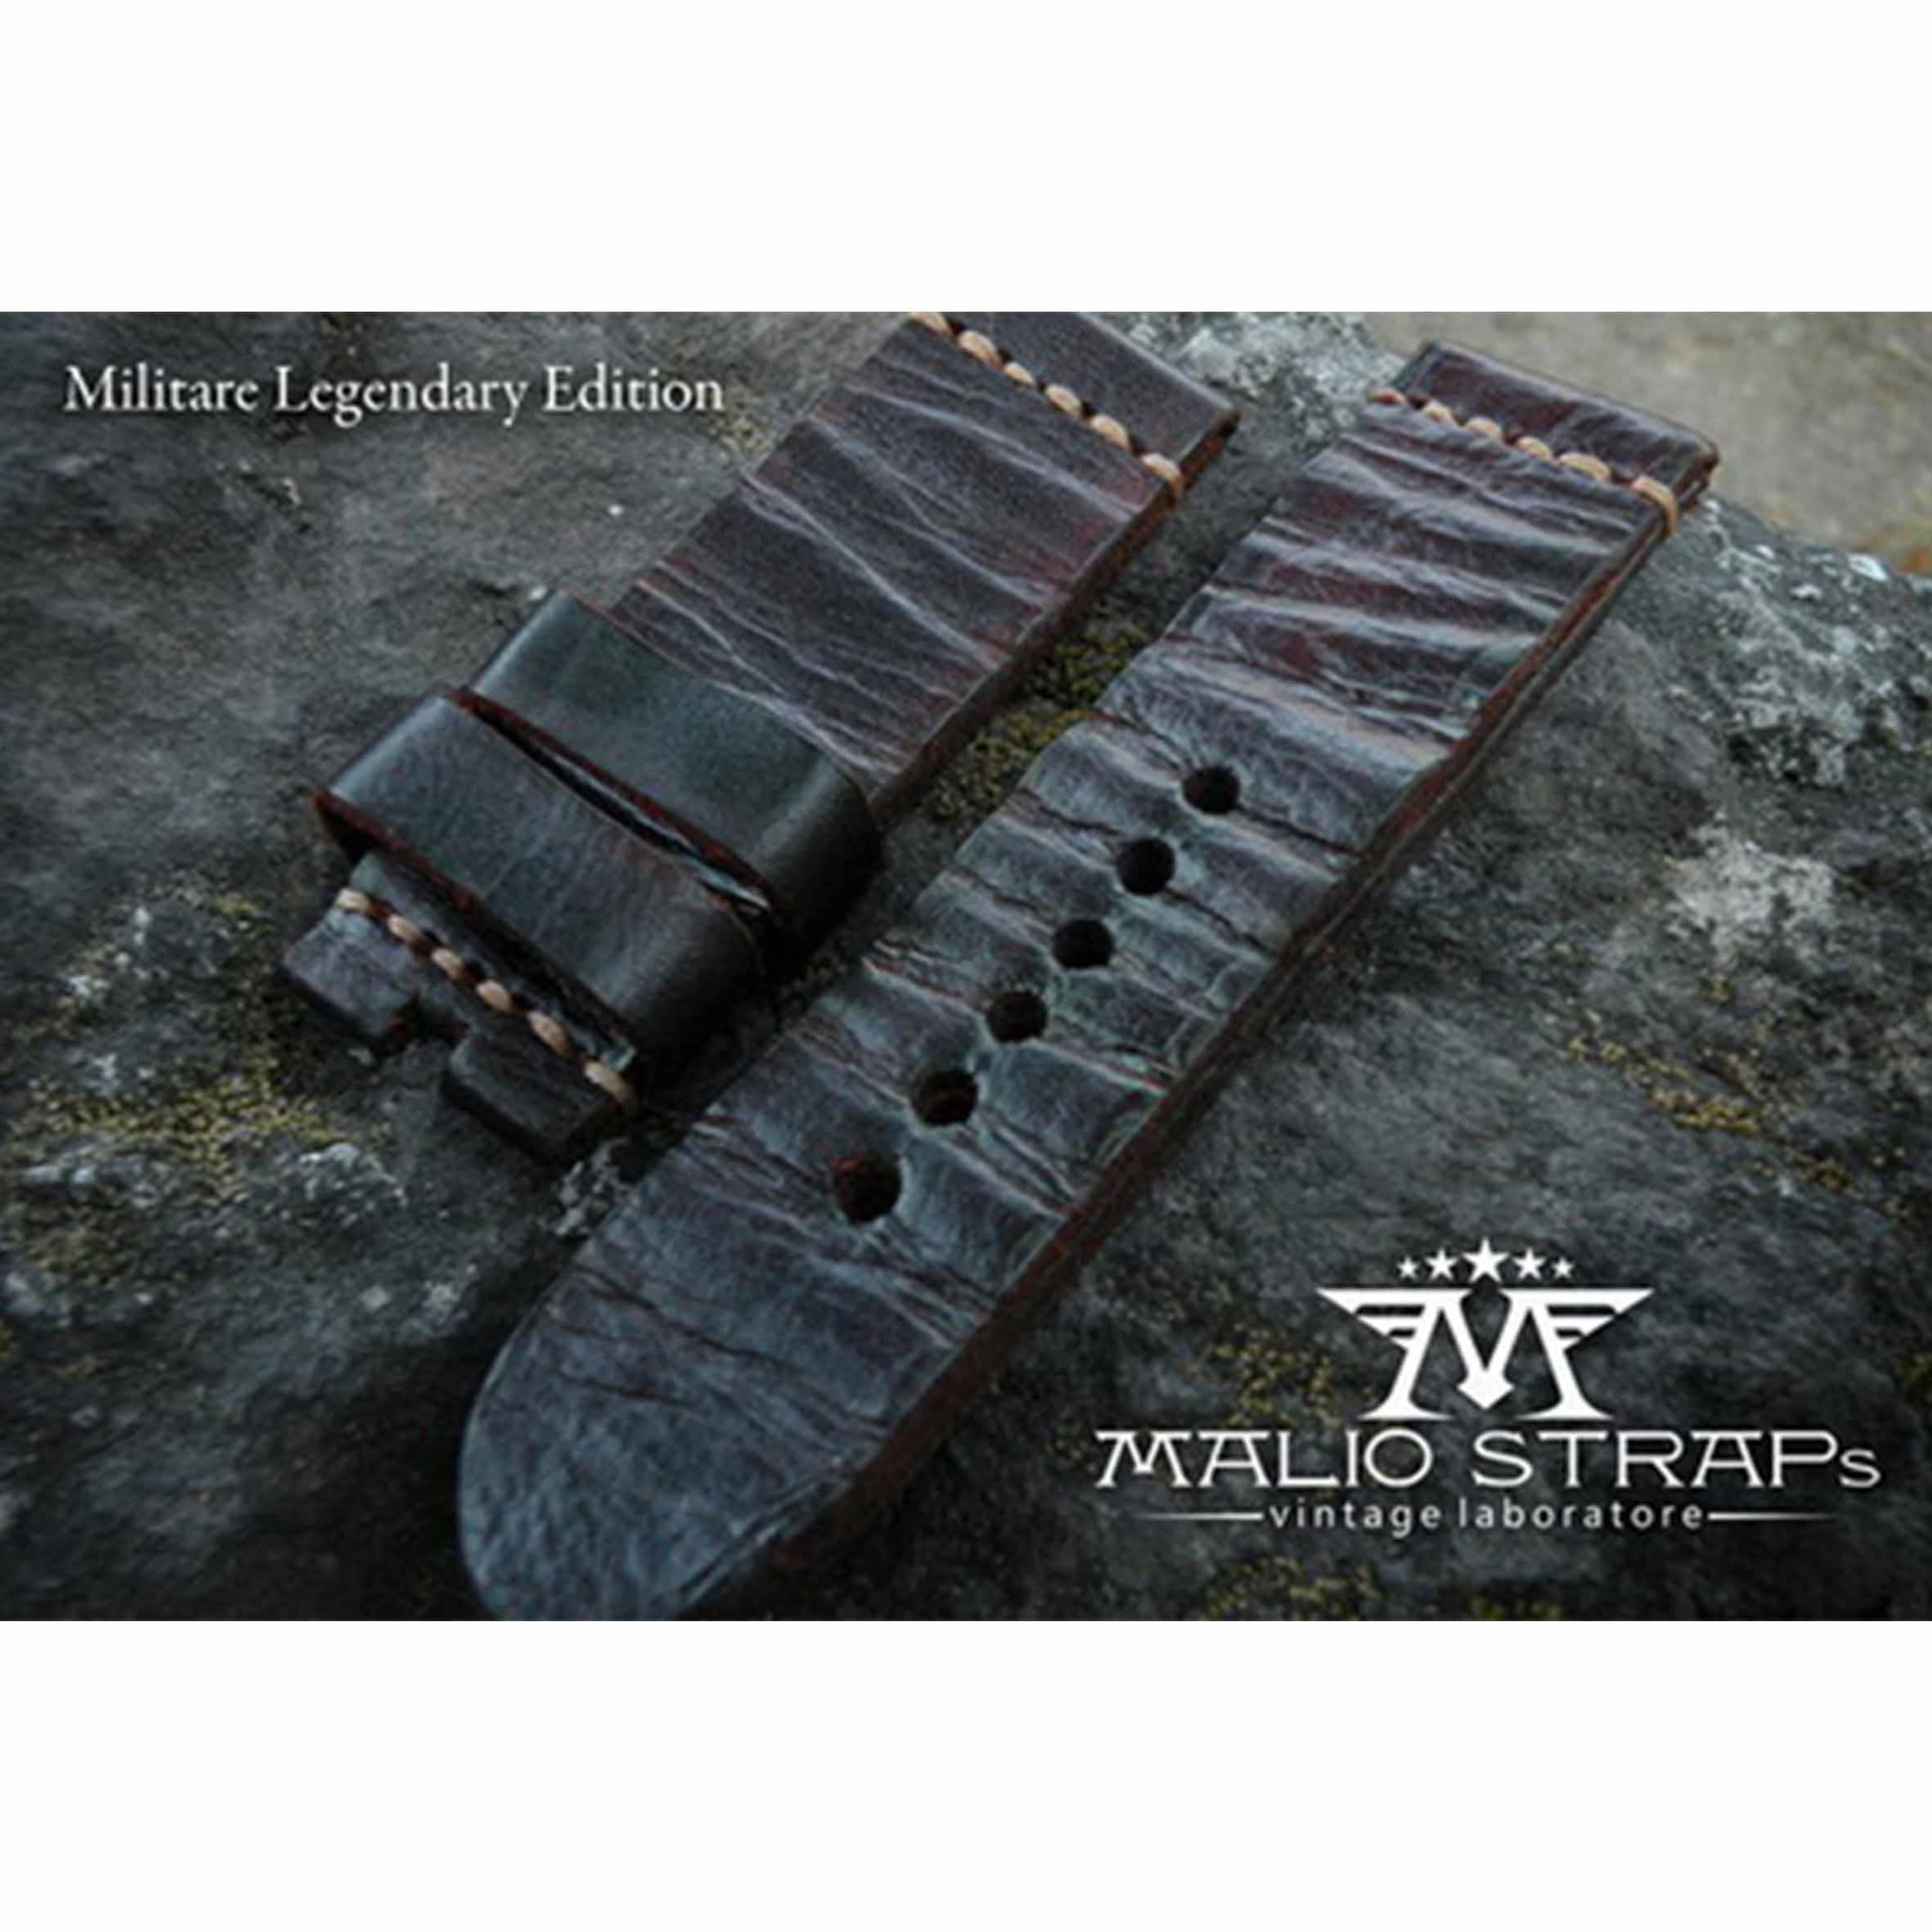 malio-straps-terrano-strapsonly (1)